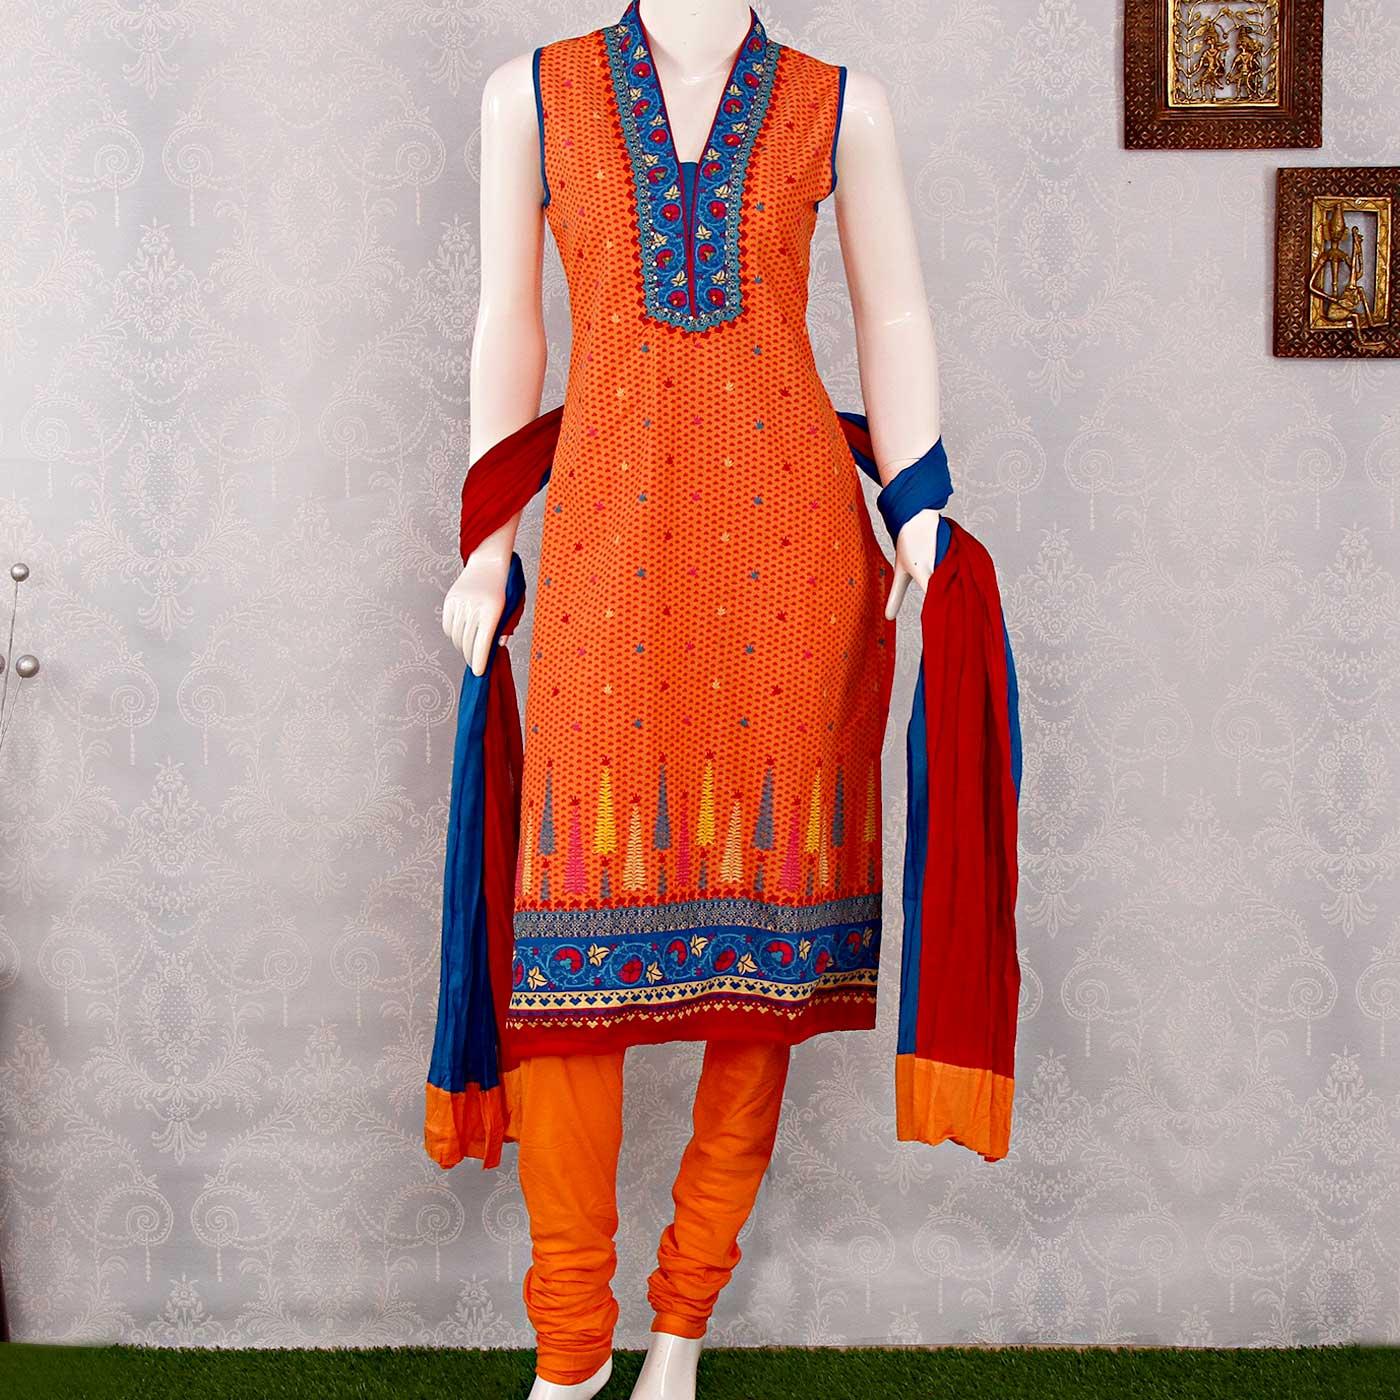 Biba Printed Cotton Sleeveless Orange Kurta Churidar With Dupatta